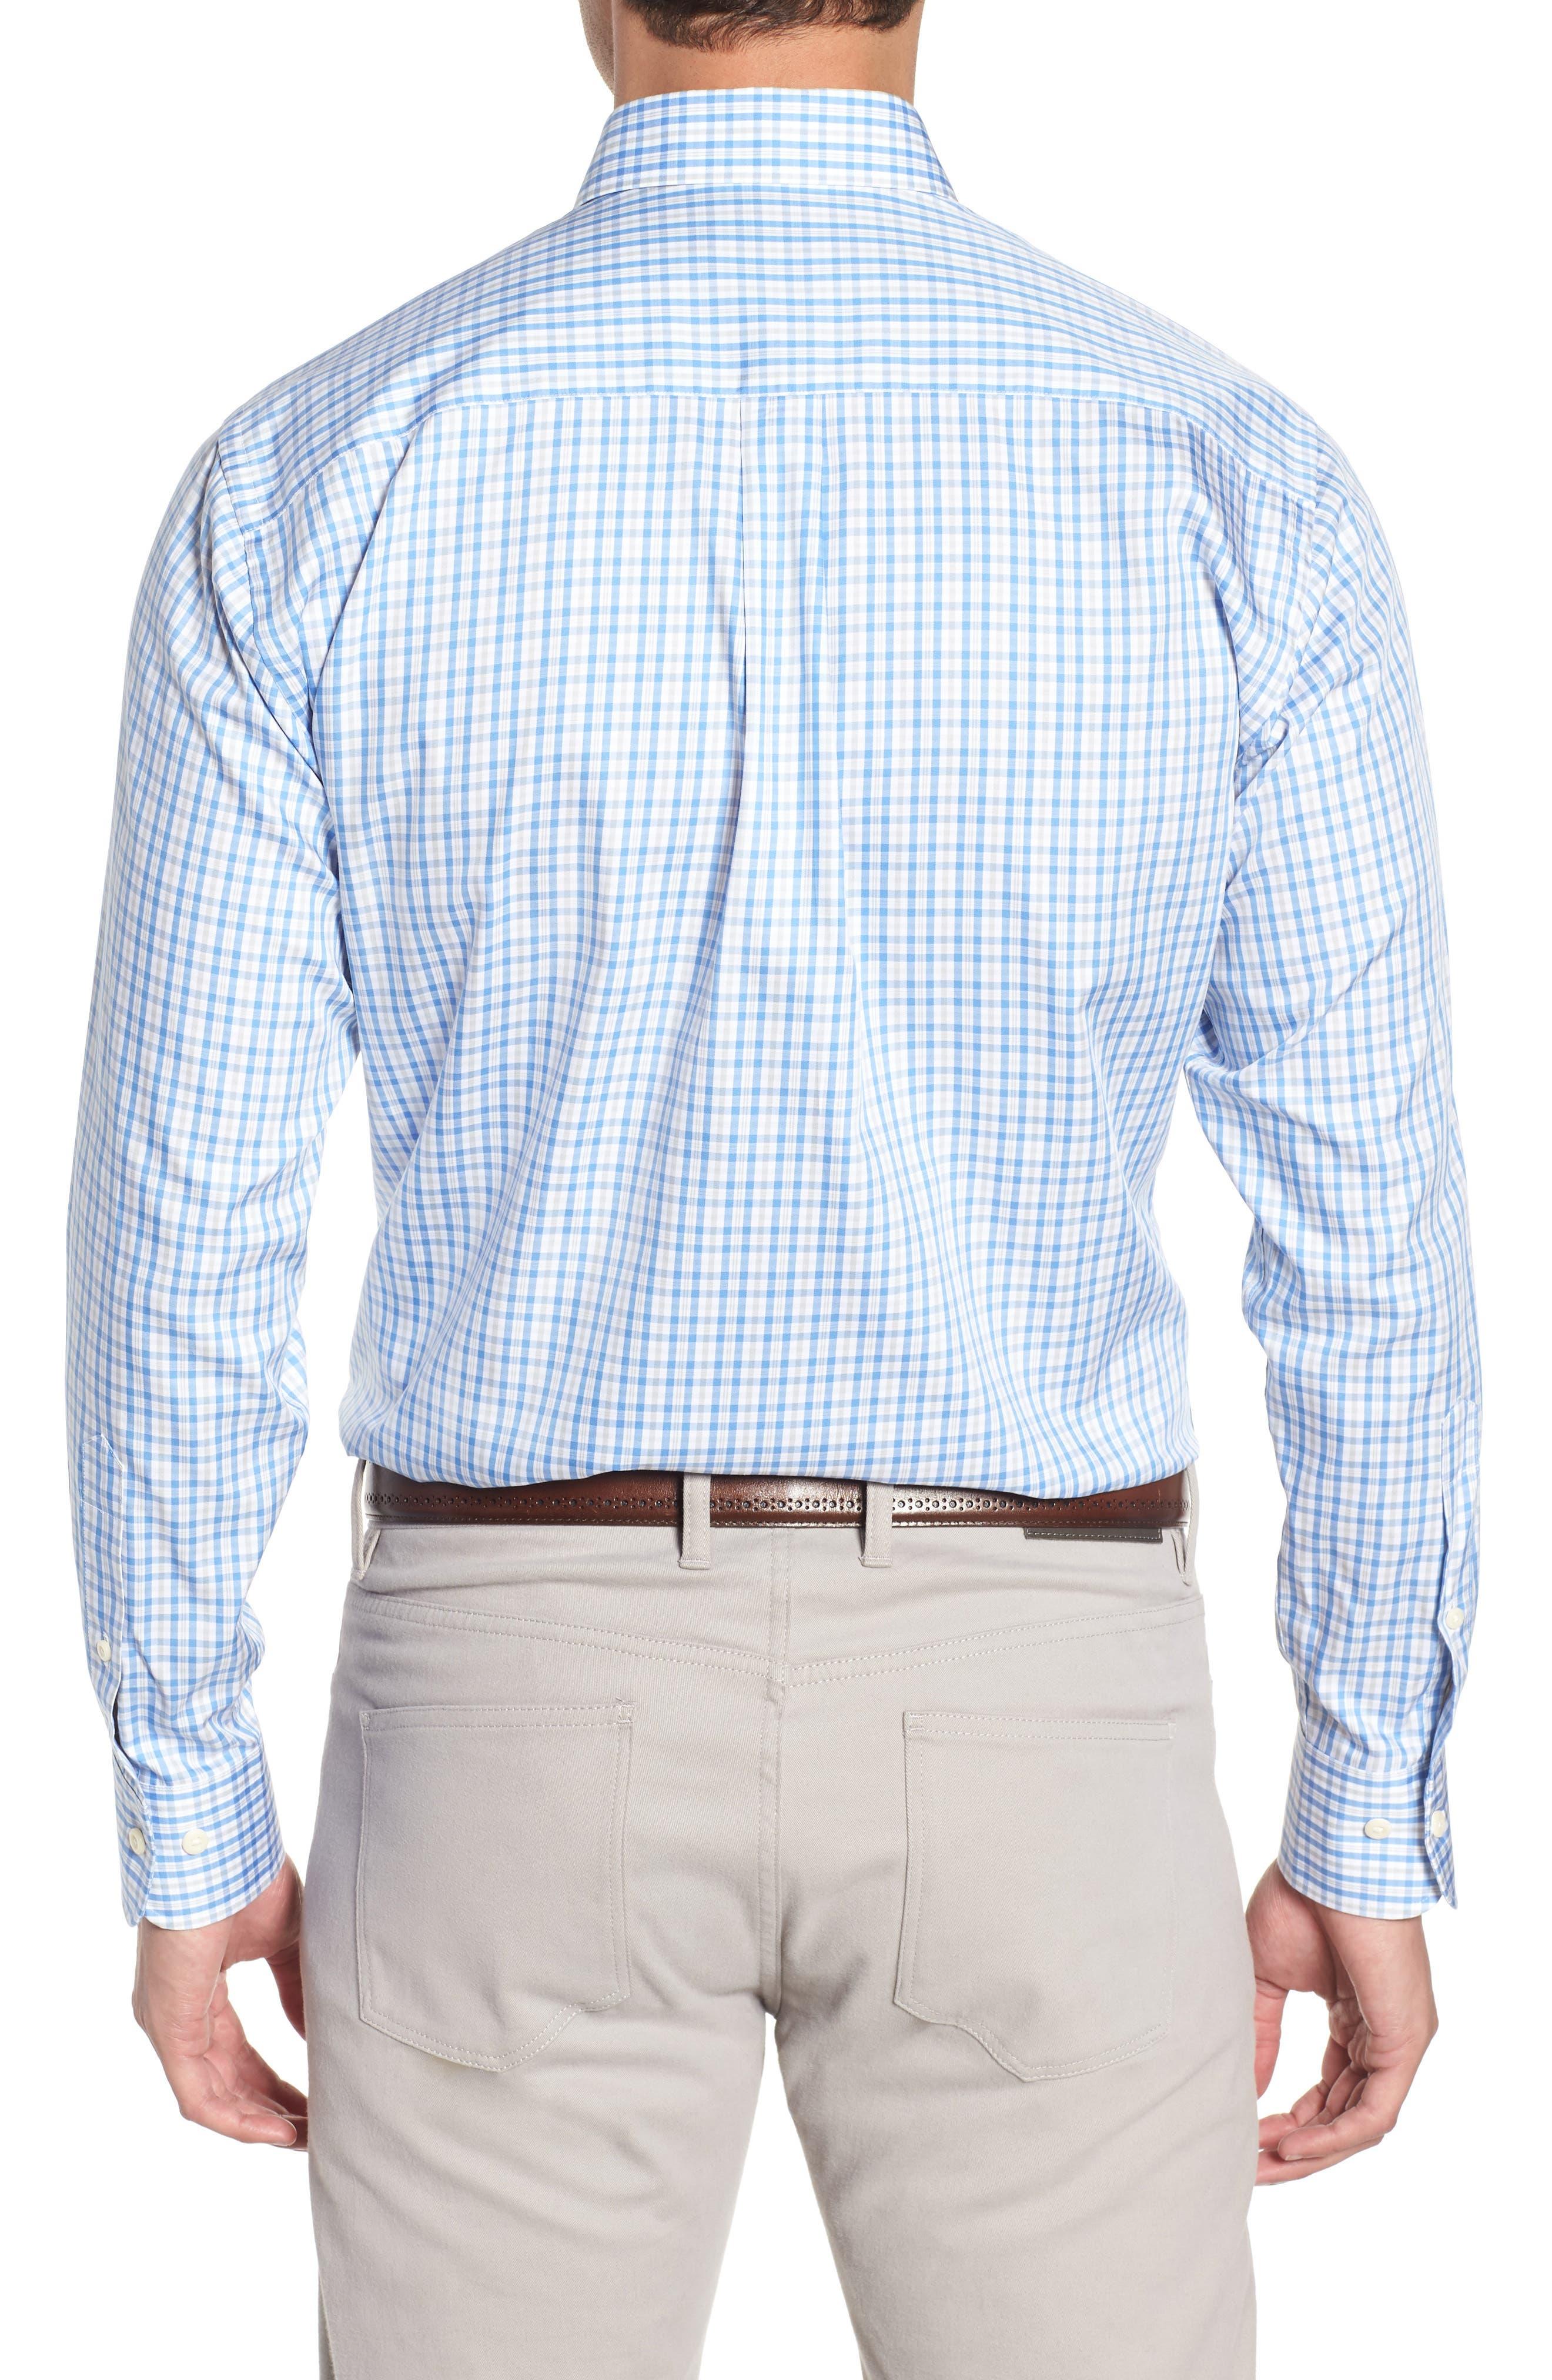 PETER MILLAR,                             Crown Soft First Hill Plaid Sport Shirt,                             Alternate thumbnail 2, color,                             485